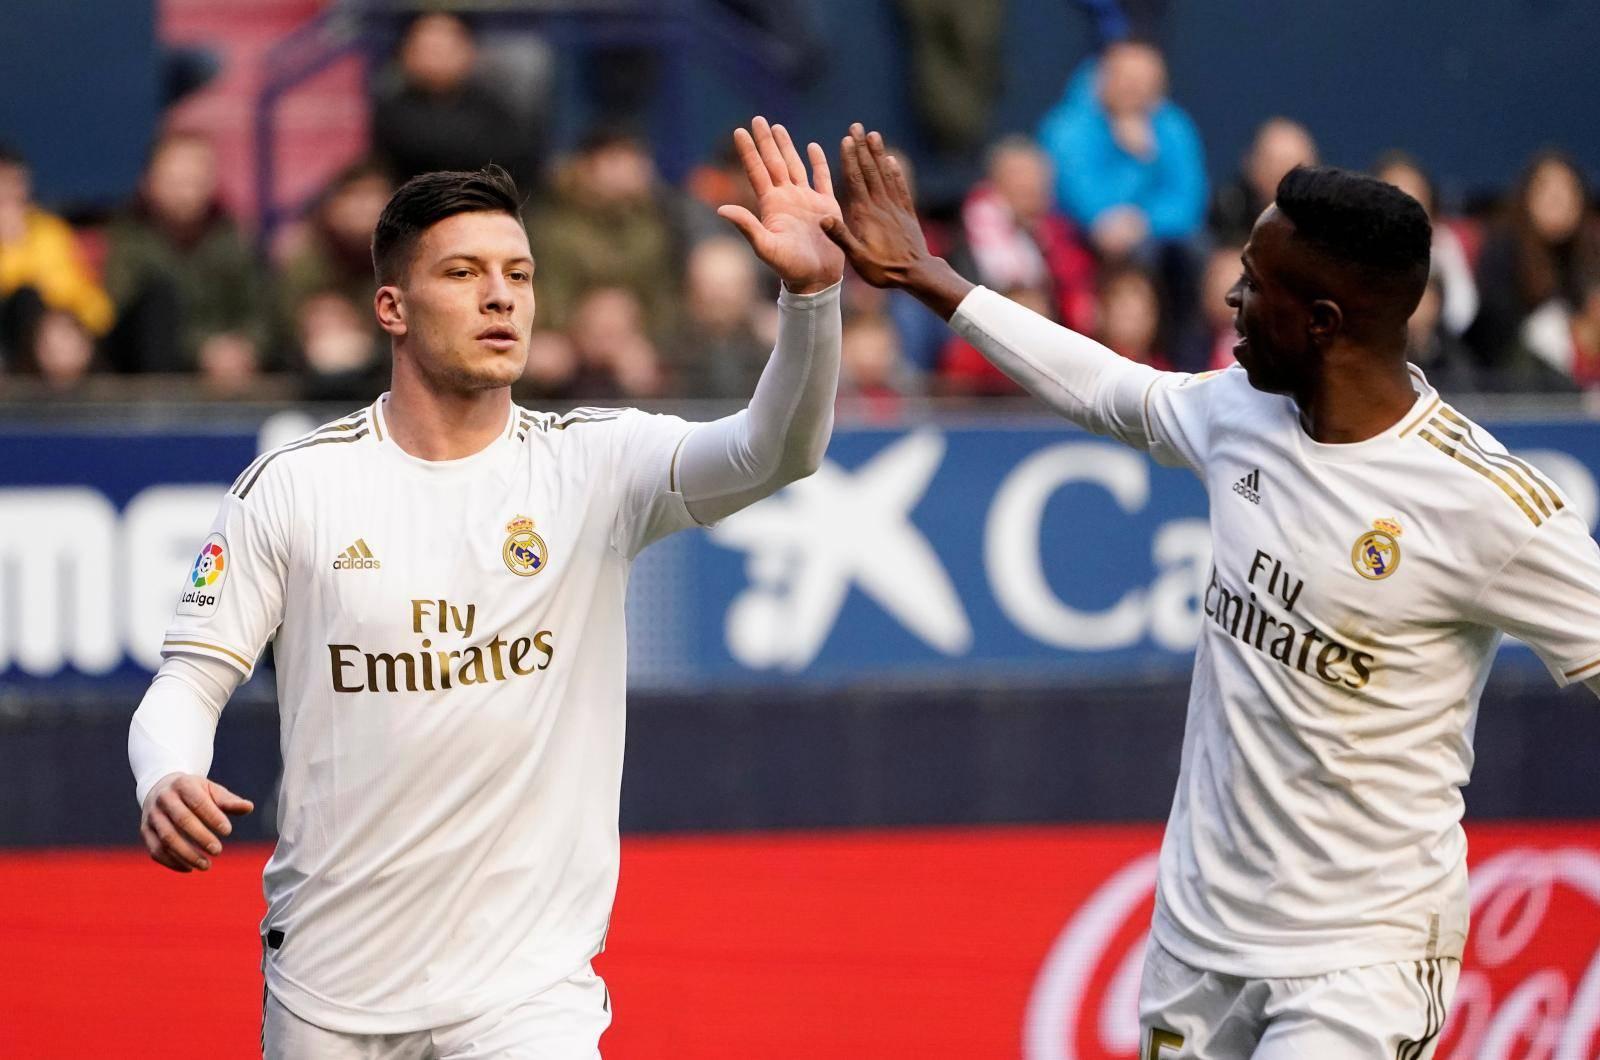 La Liga Santander - Osasuna v Real Madrid